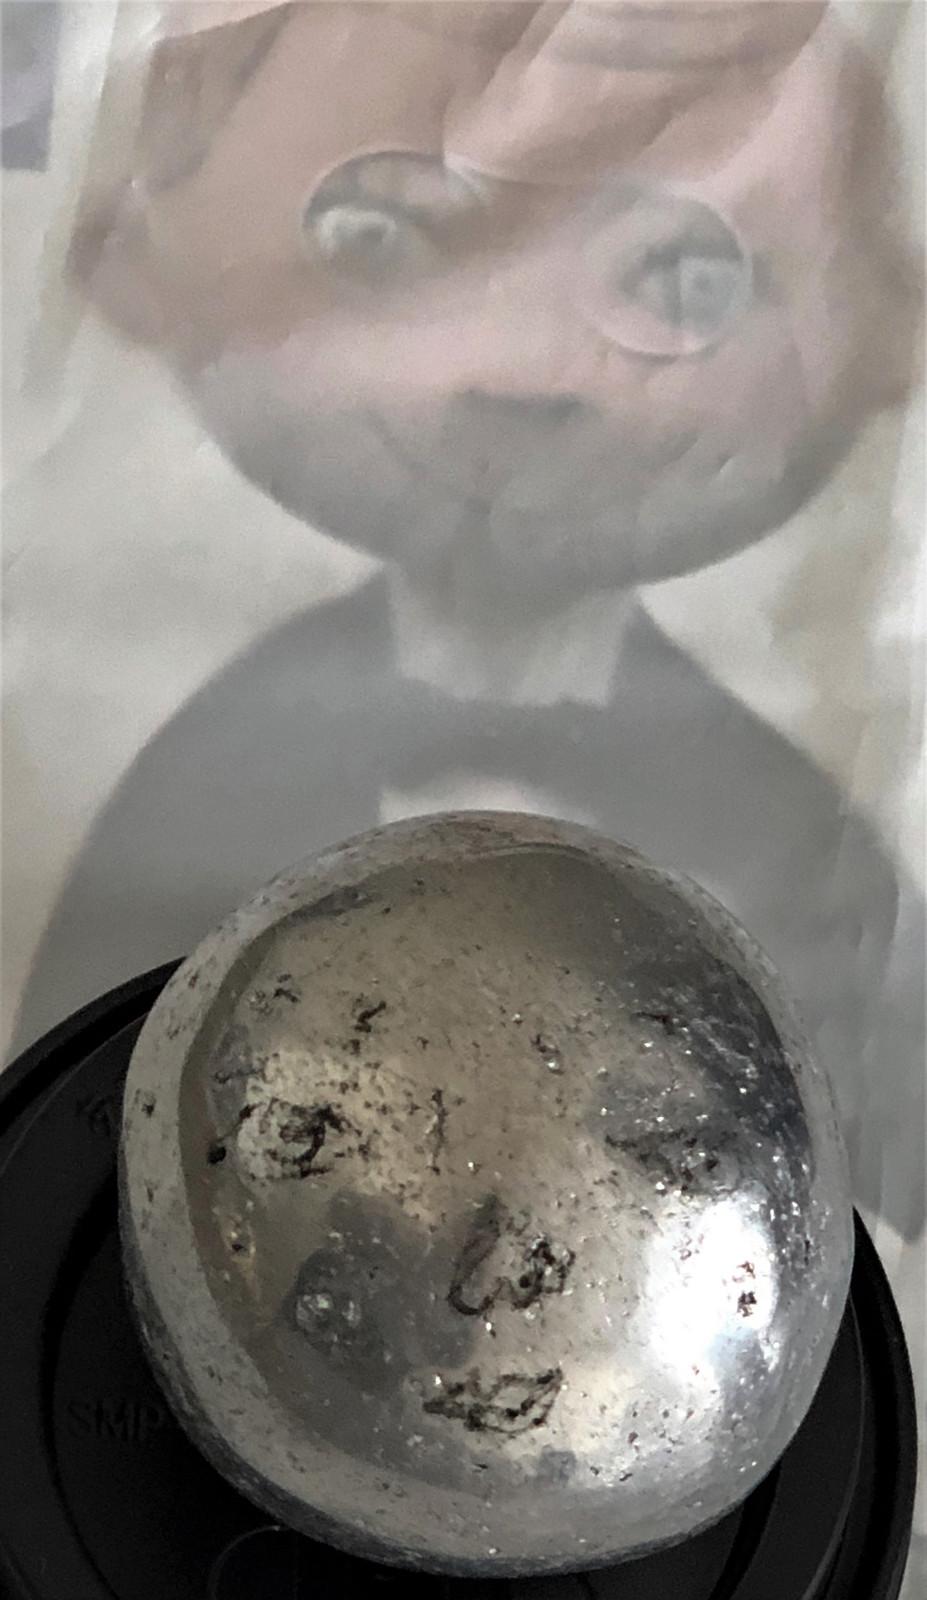 20180504_102312